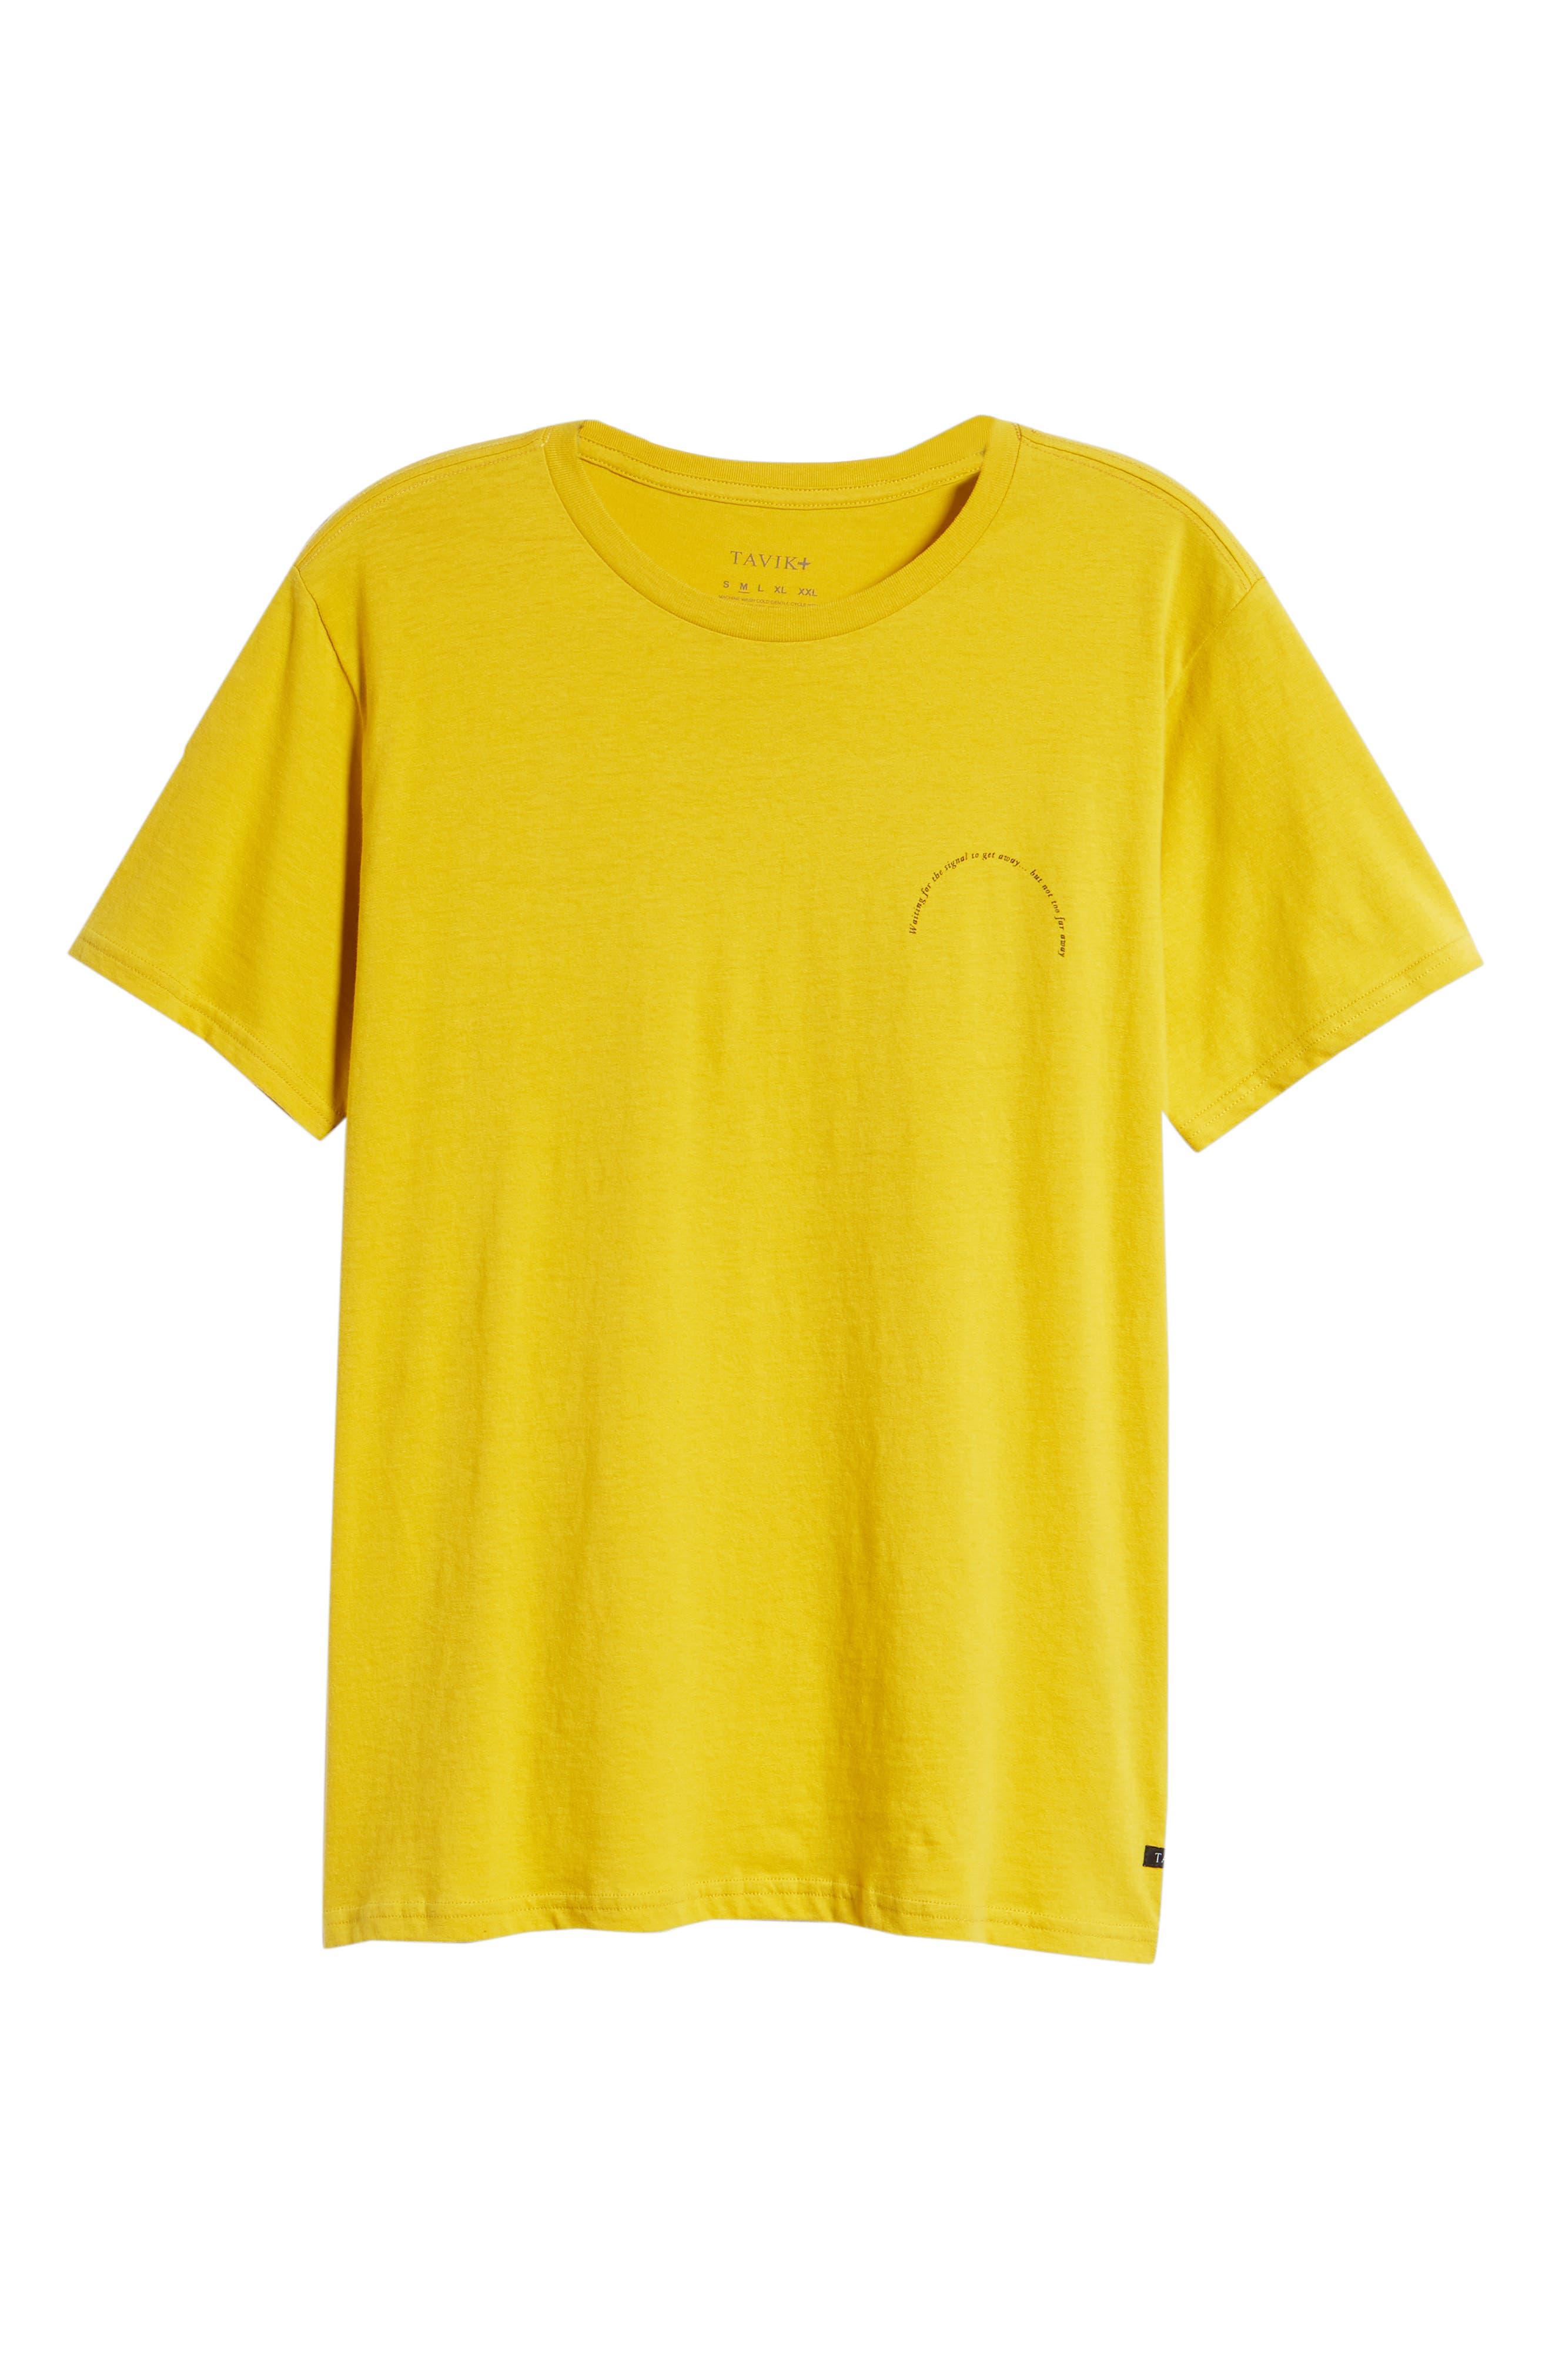 Twin Palms Graphic T-Shirt,                             Alternate thumbnail 6, color,                             701